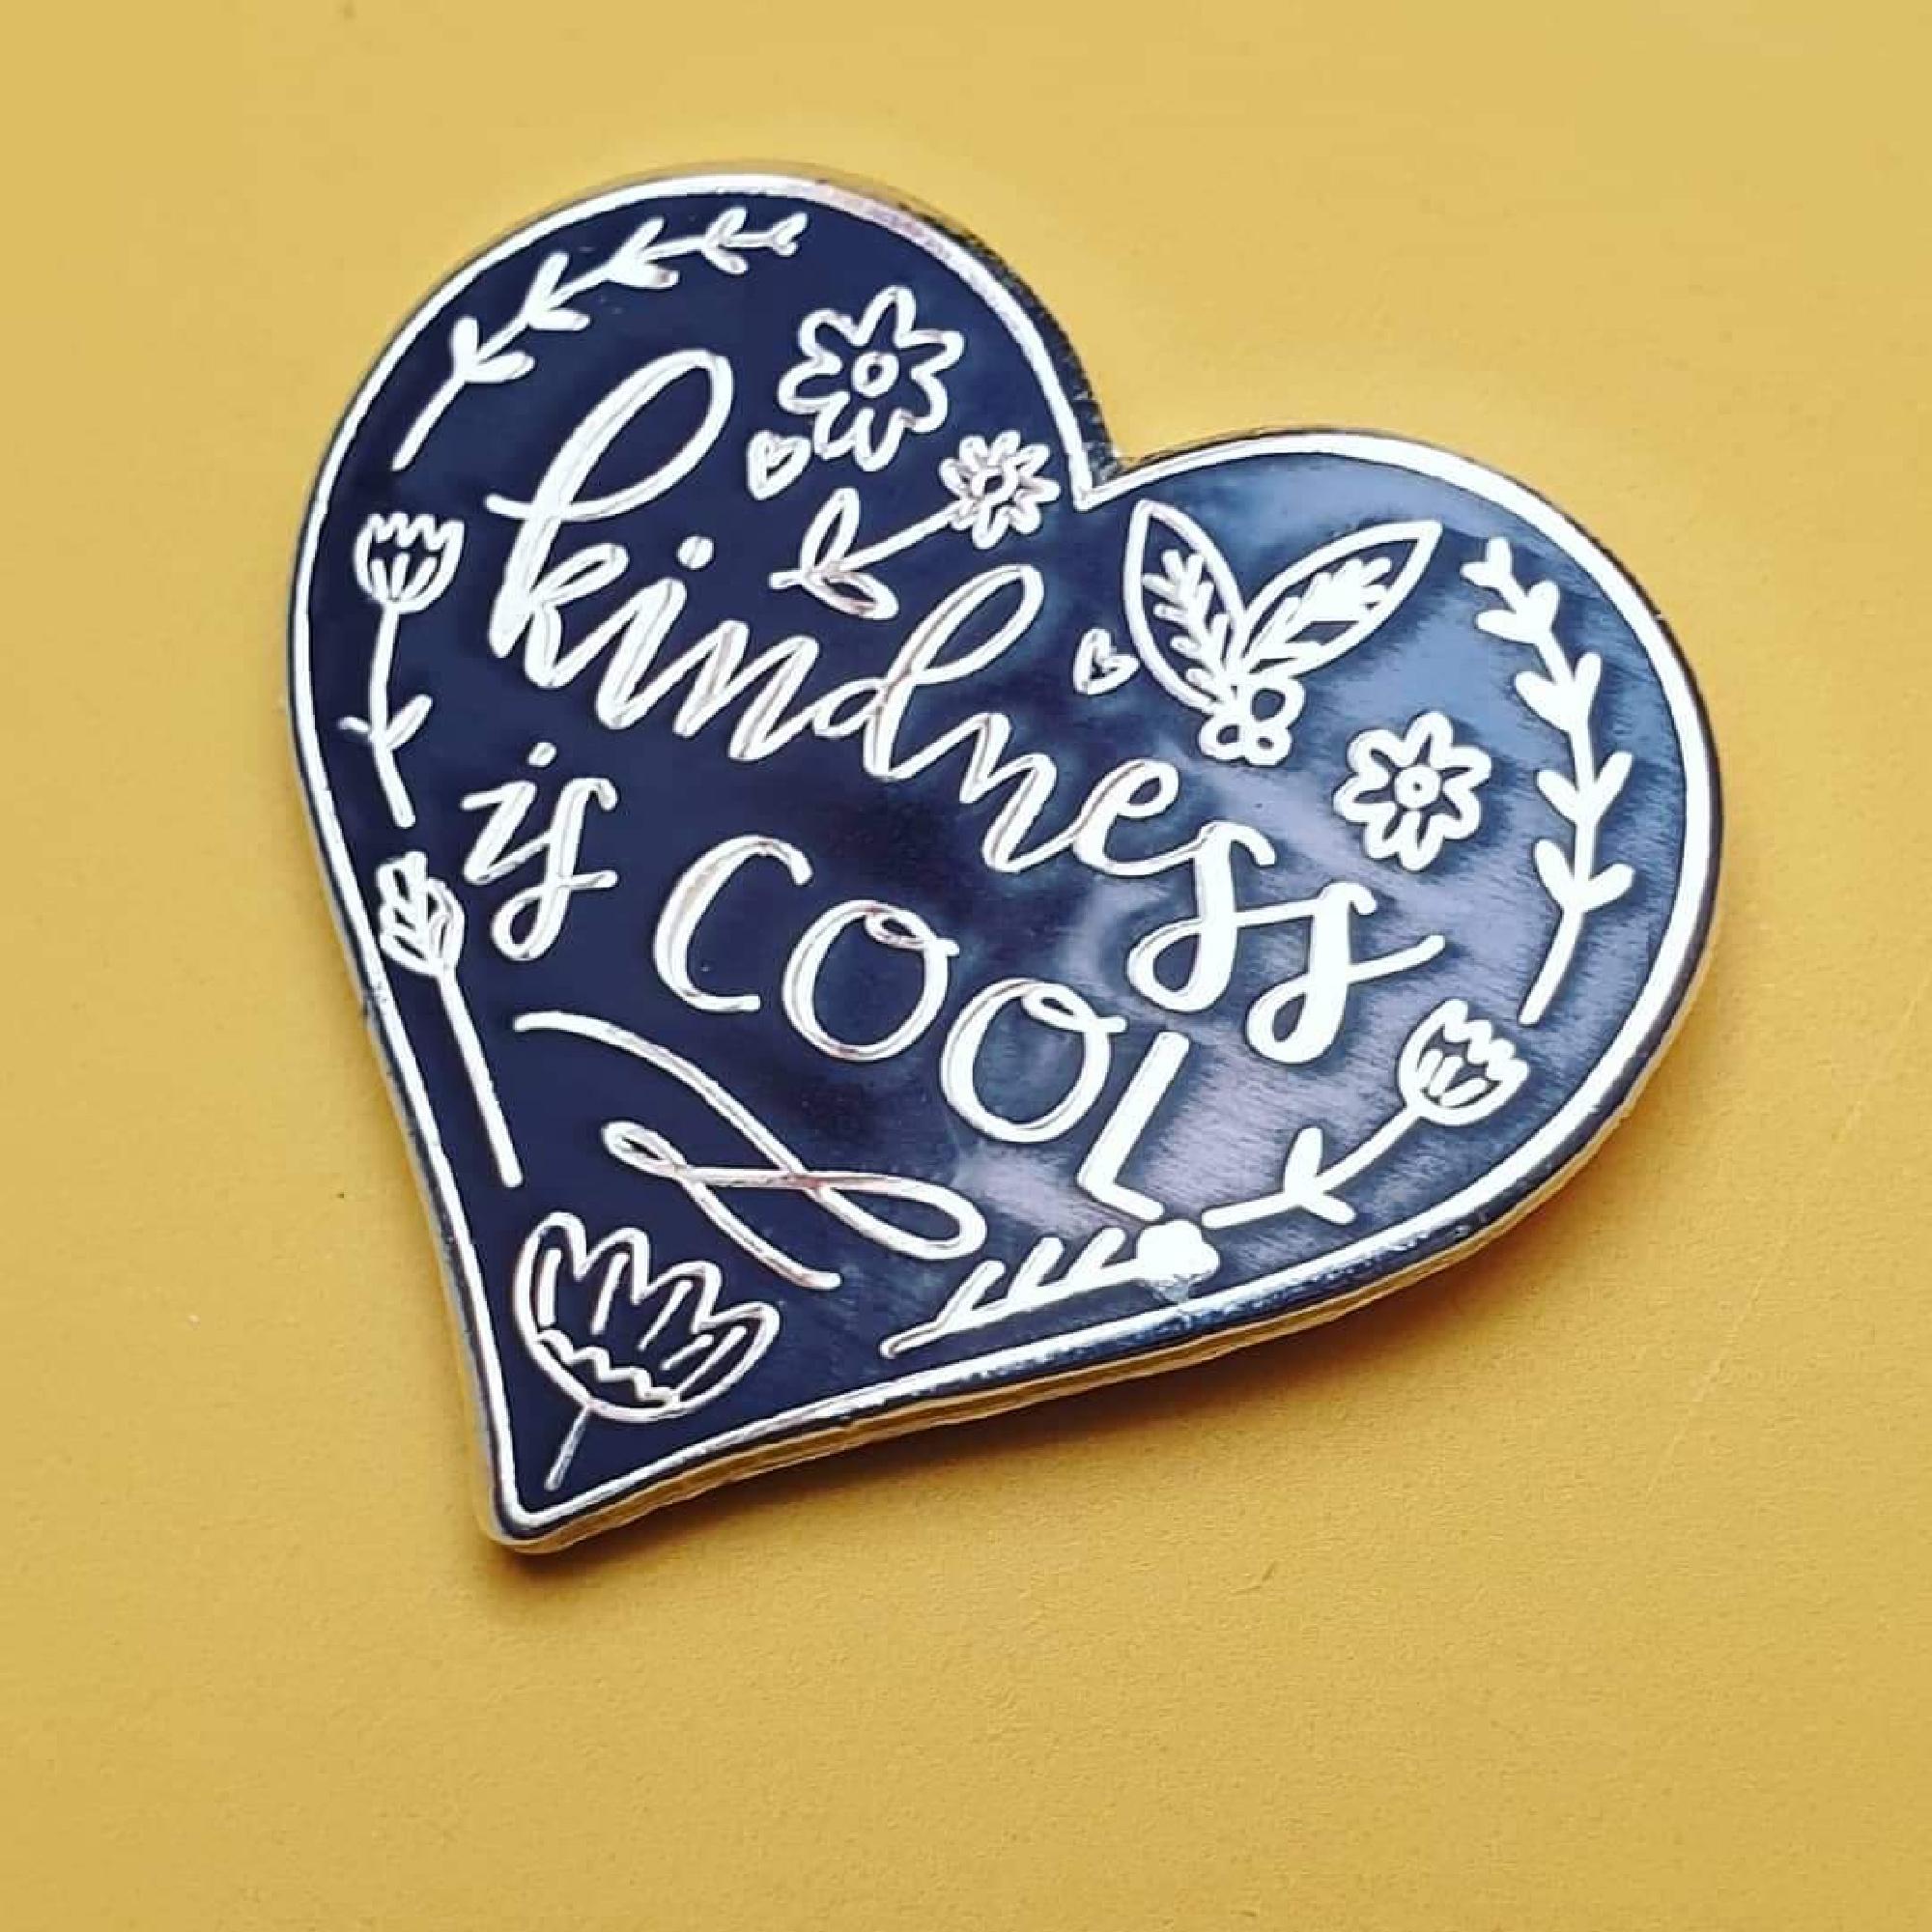 Kindness is Cool Enamel Pin